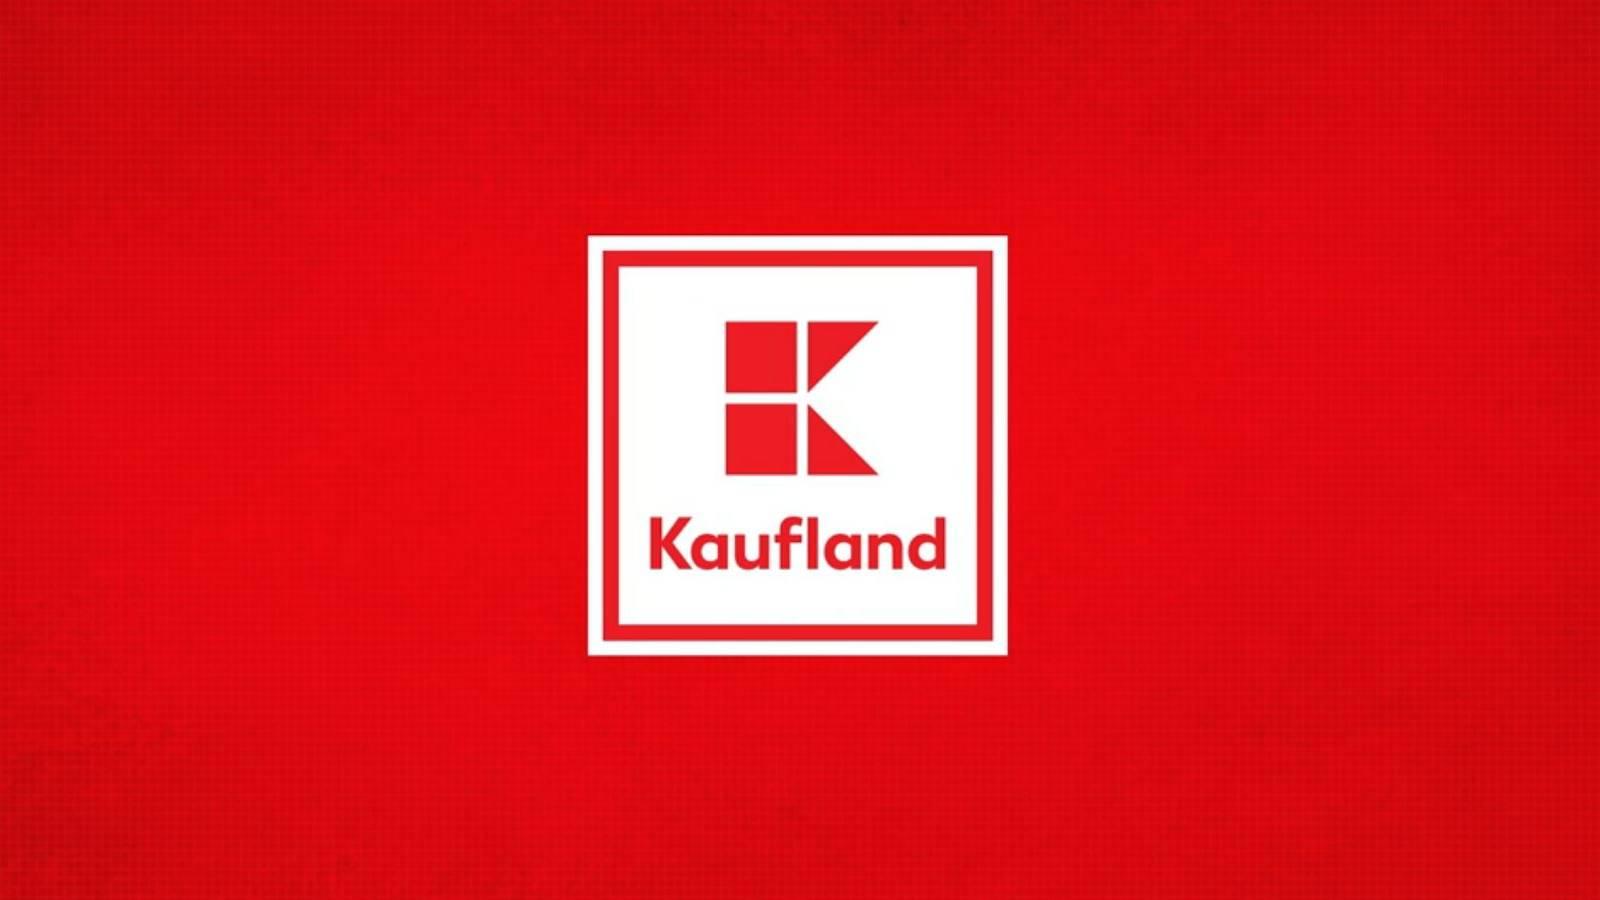 Kaufland voturi produse